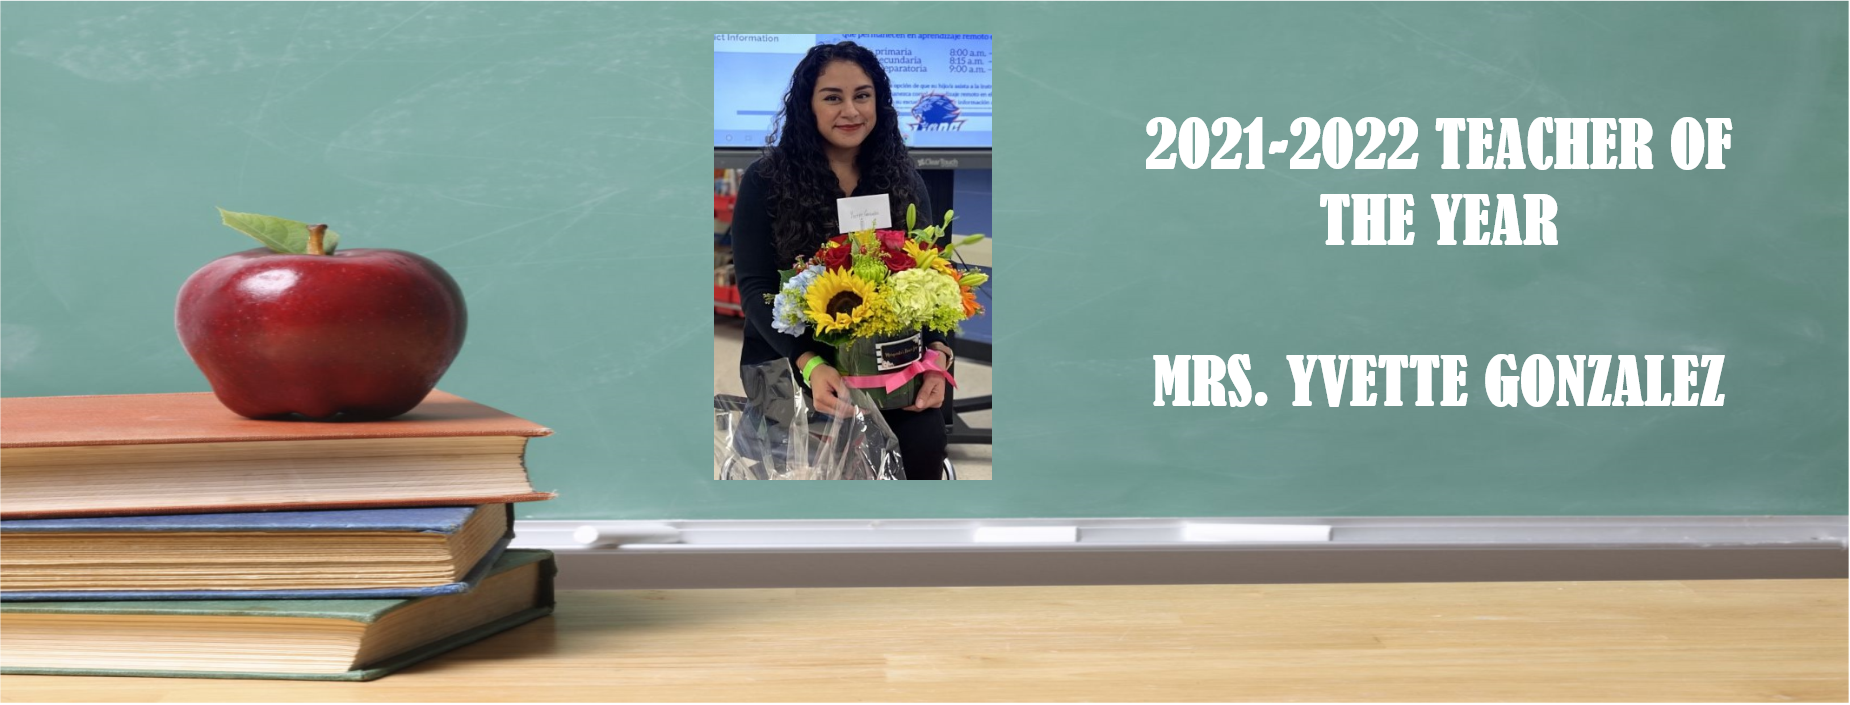 2021-2022 TEACHER OF THE YEAR